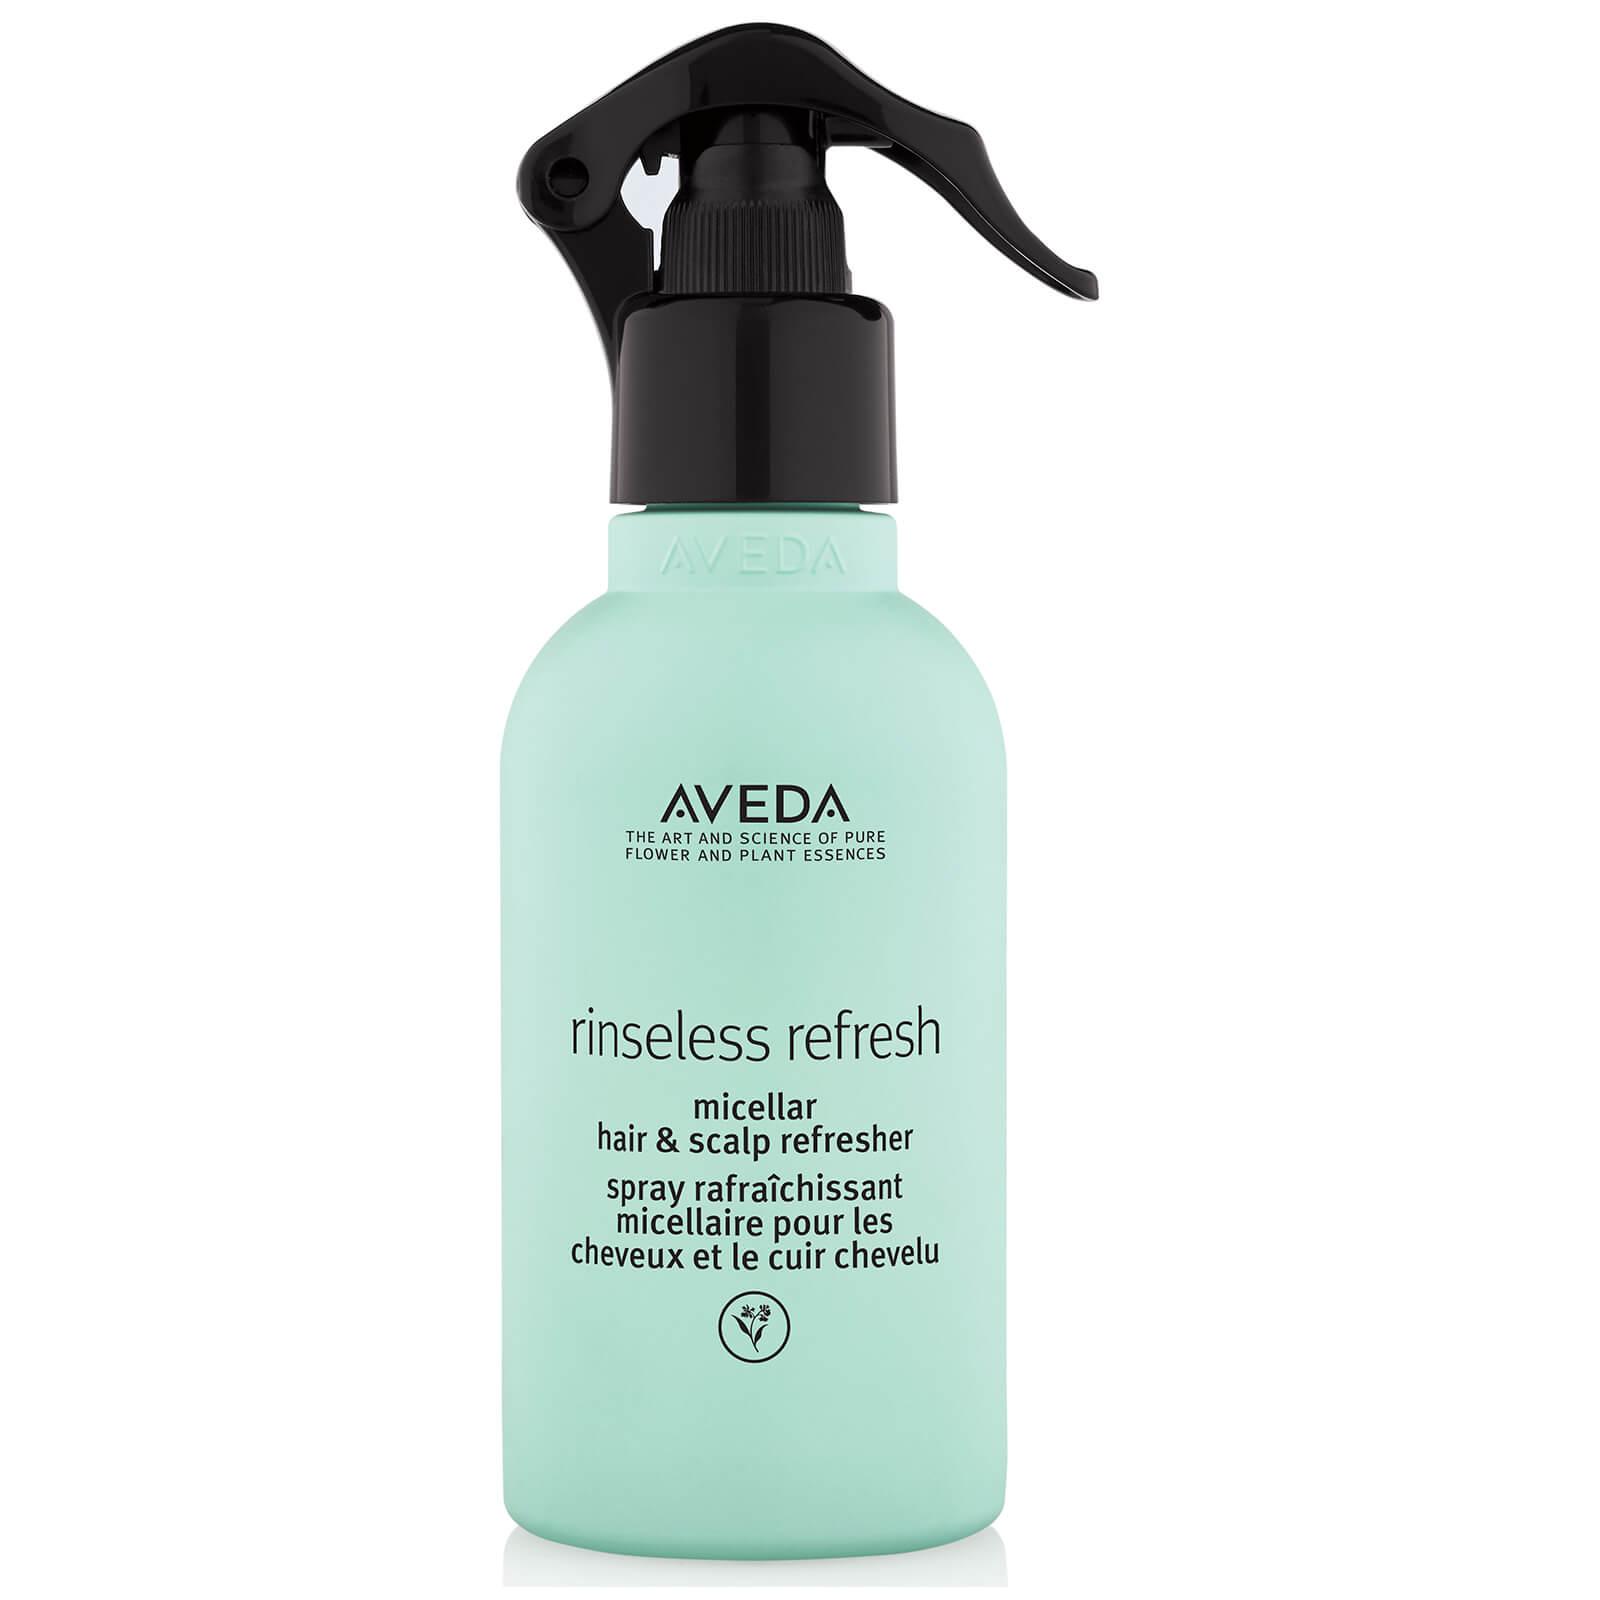 Aveda Rinseless Refresh Micellar Hair and Scalp Refresher 200ml